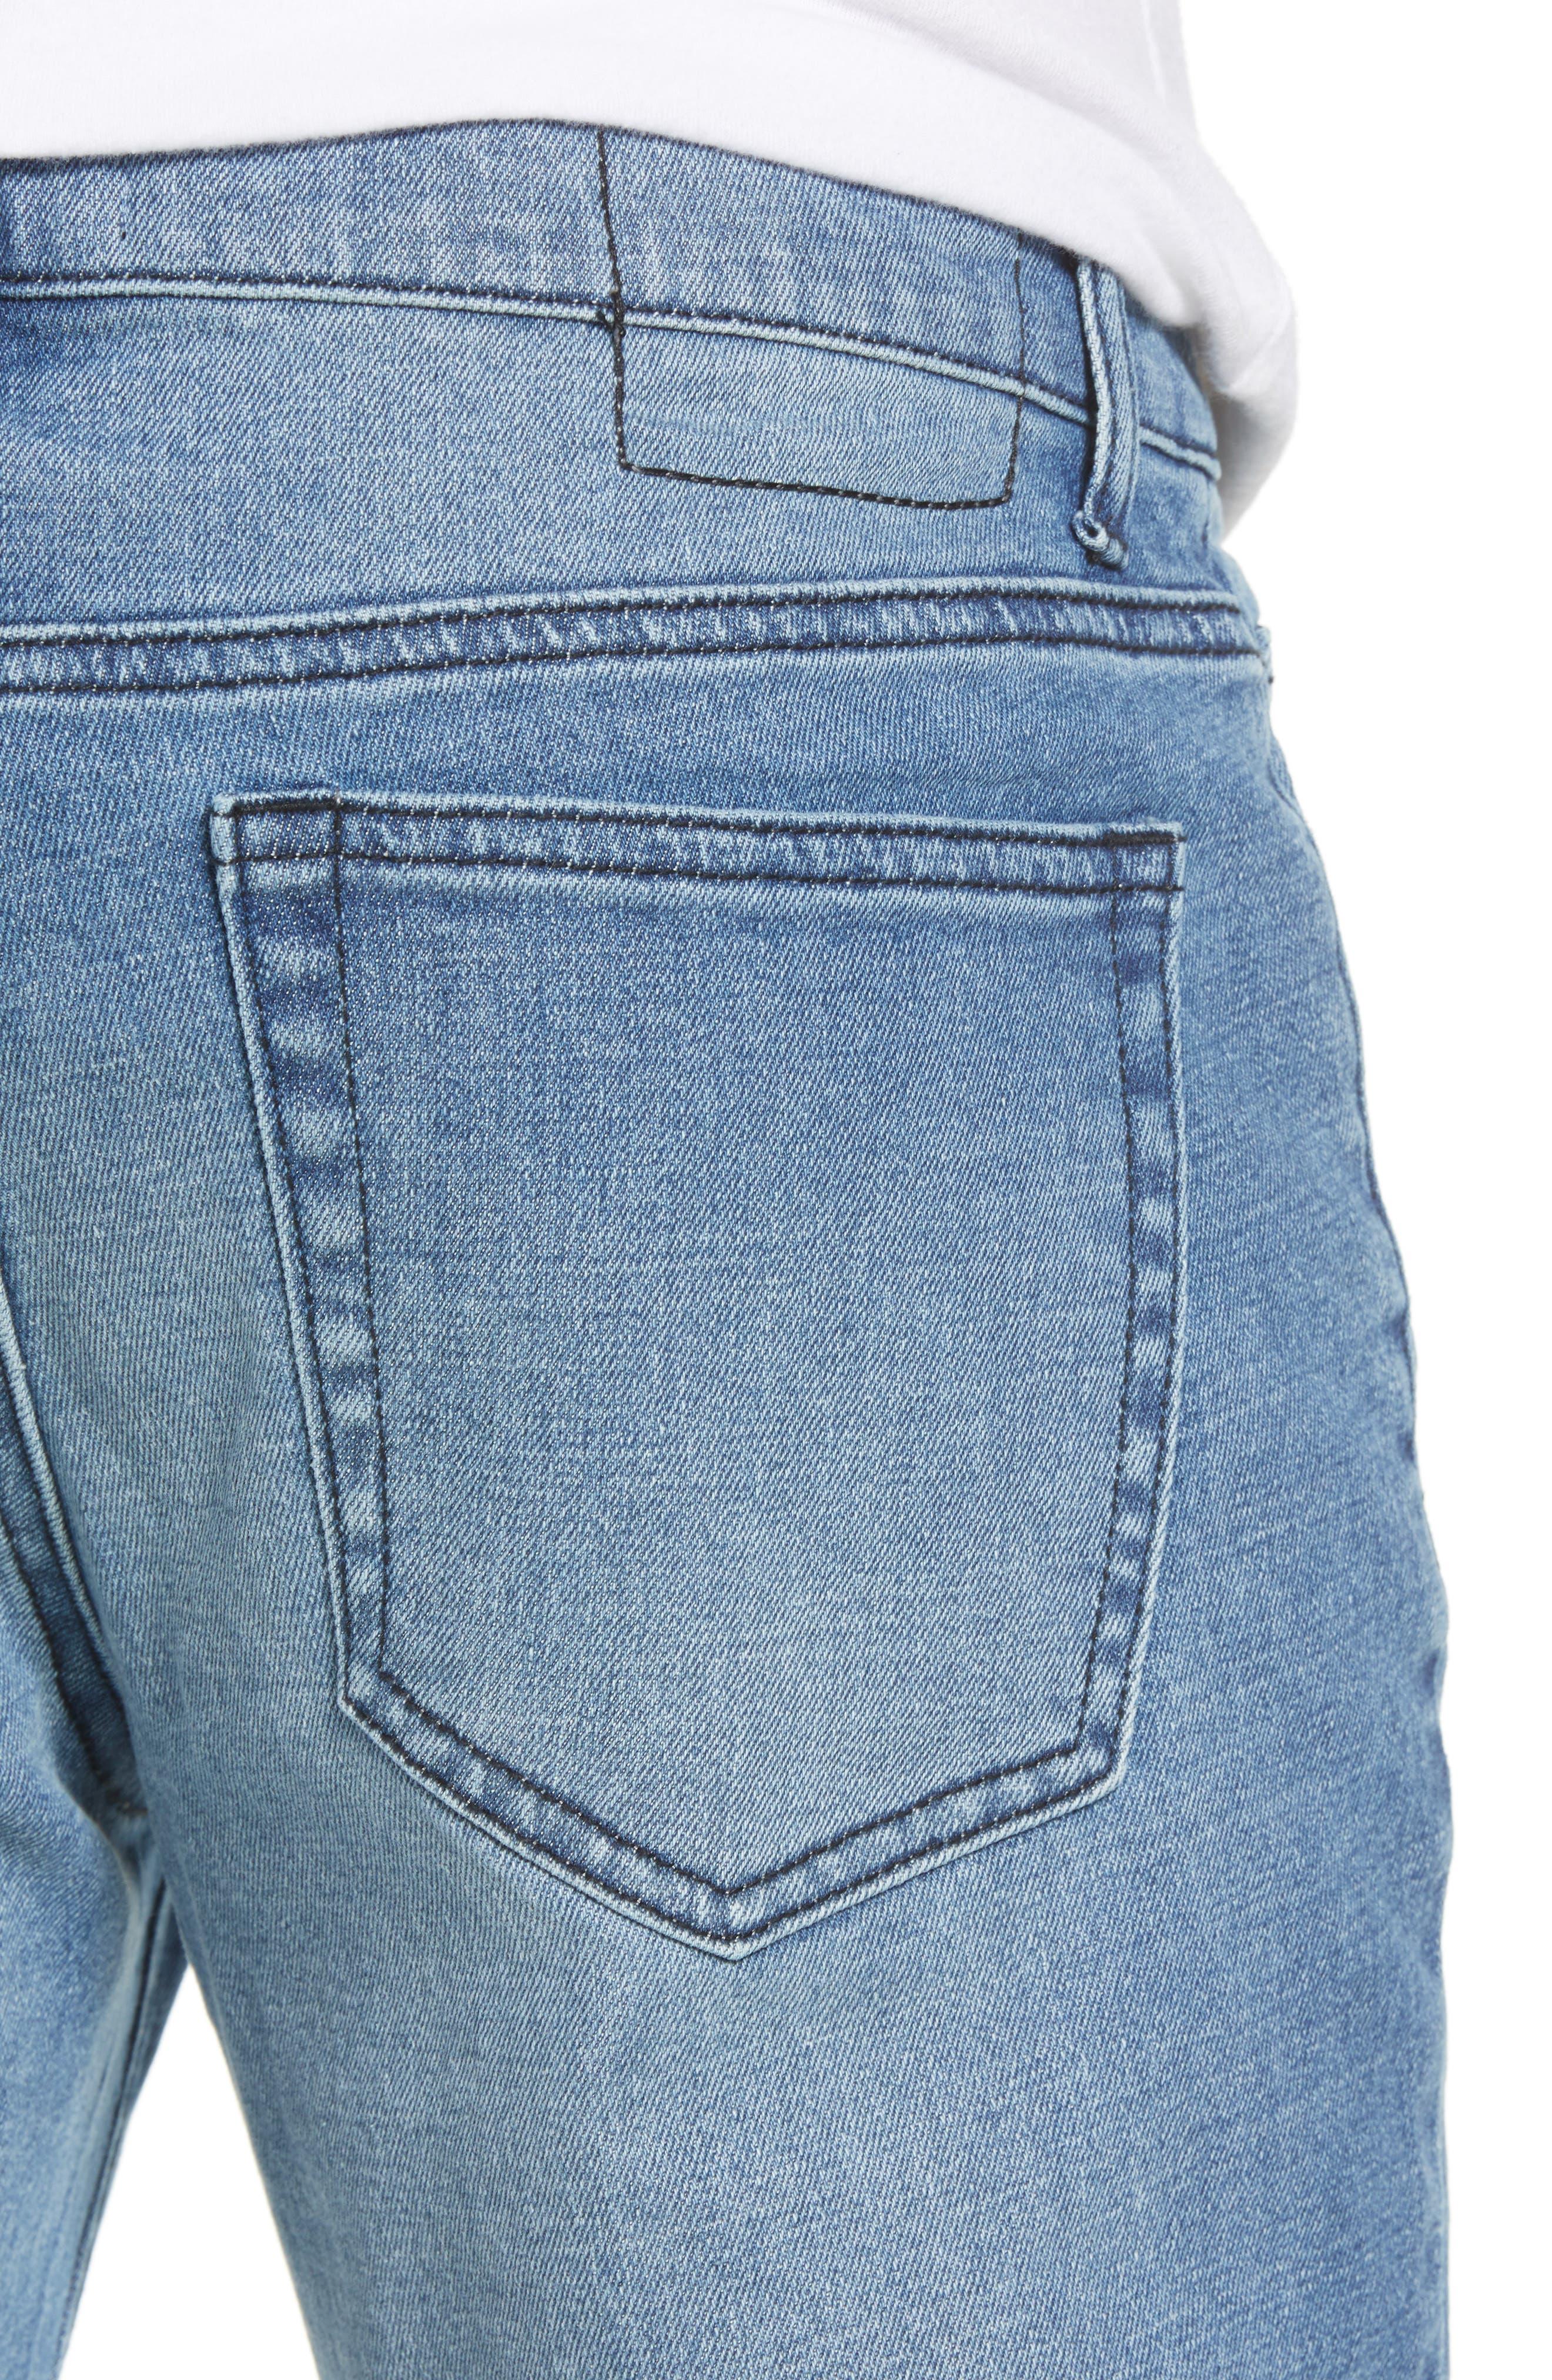 Skinny Moto Jeans,                             Alternate thumbnail 4, color,                             BLUE RIVERS WASH